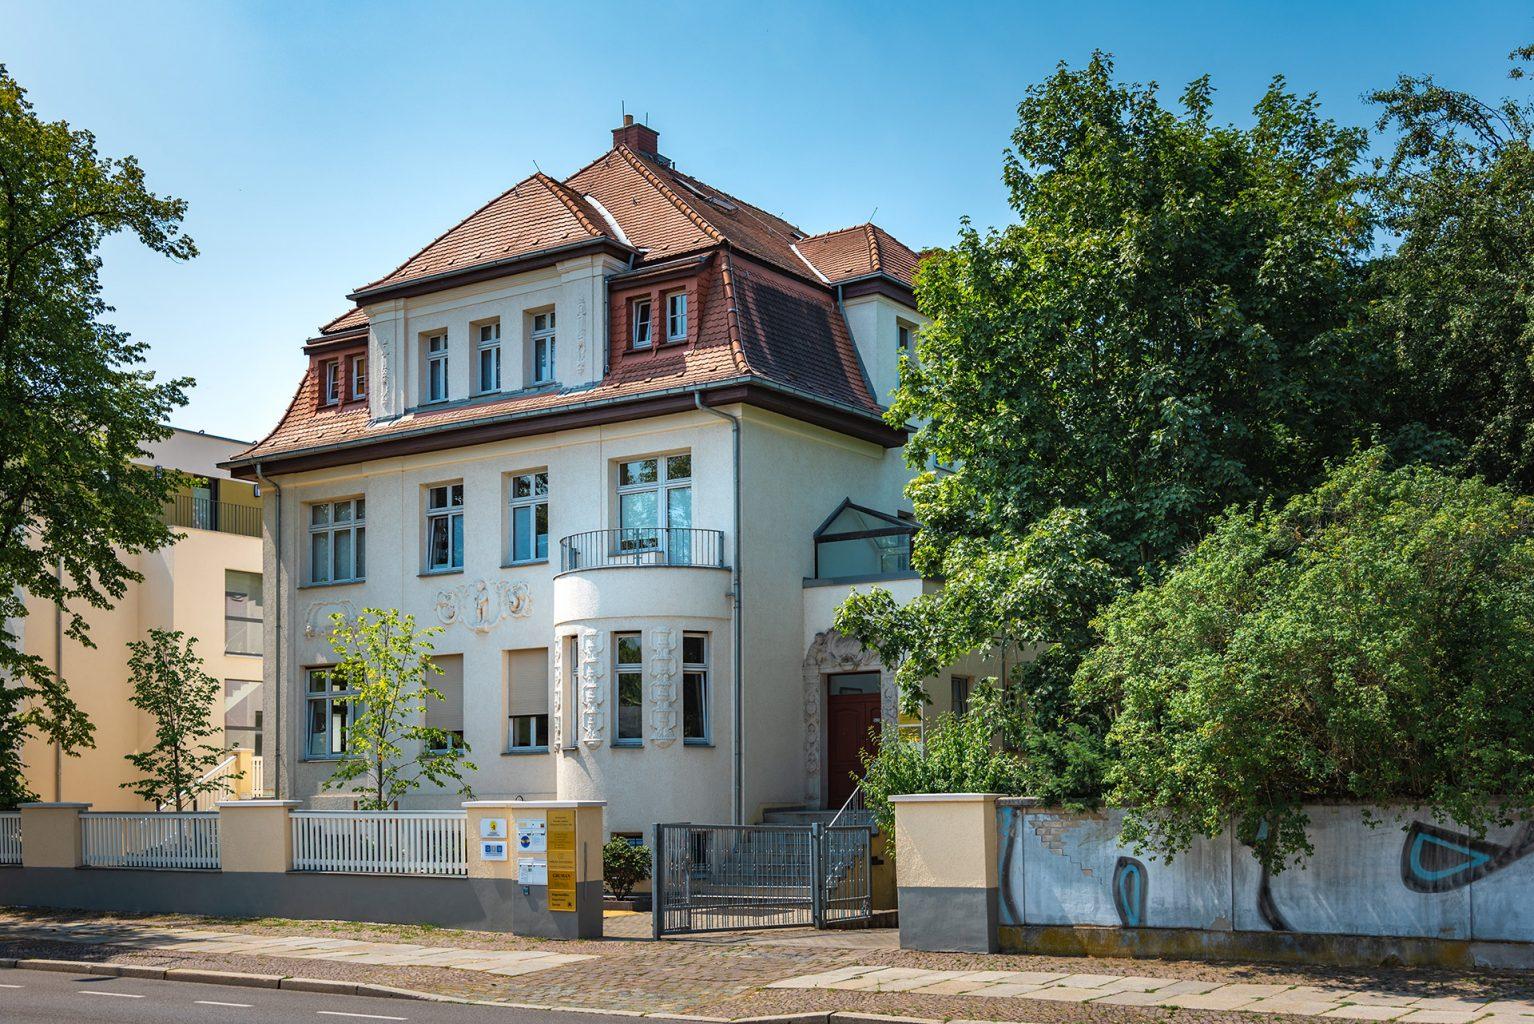 Windscheidstraße 2 - Leipzig - Alexander Malios